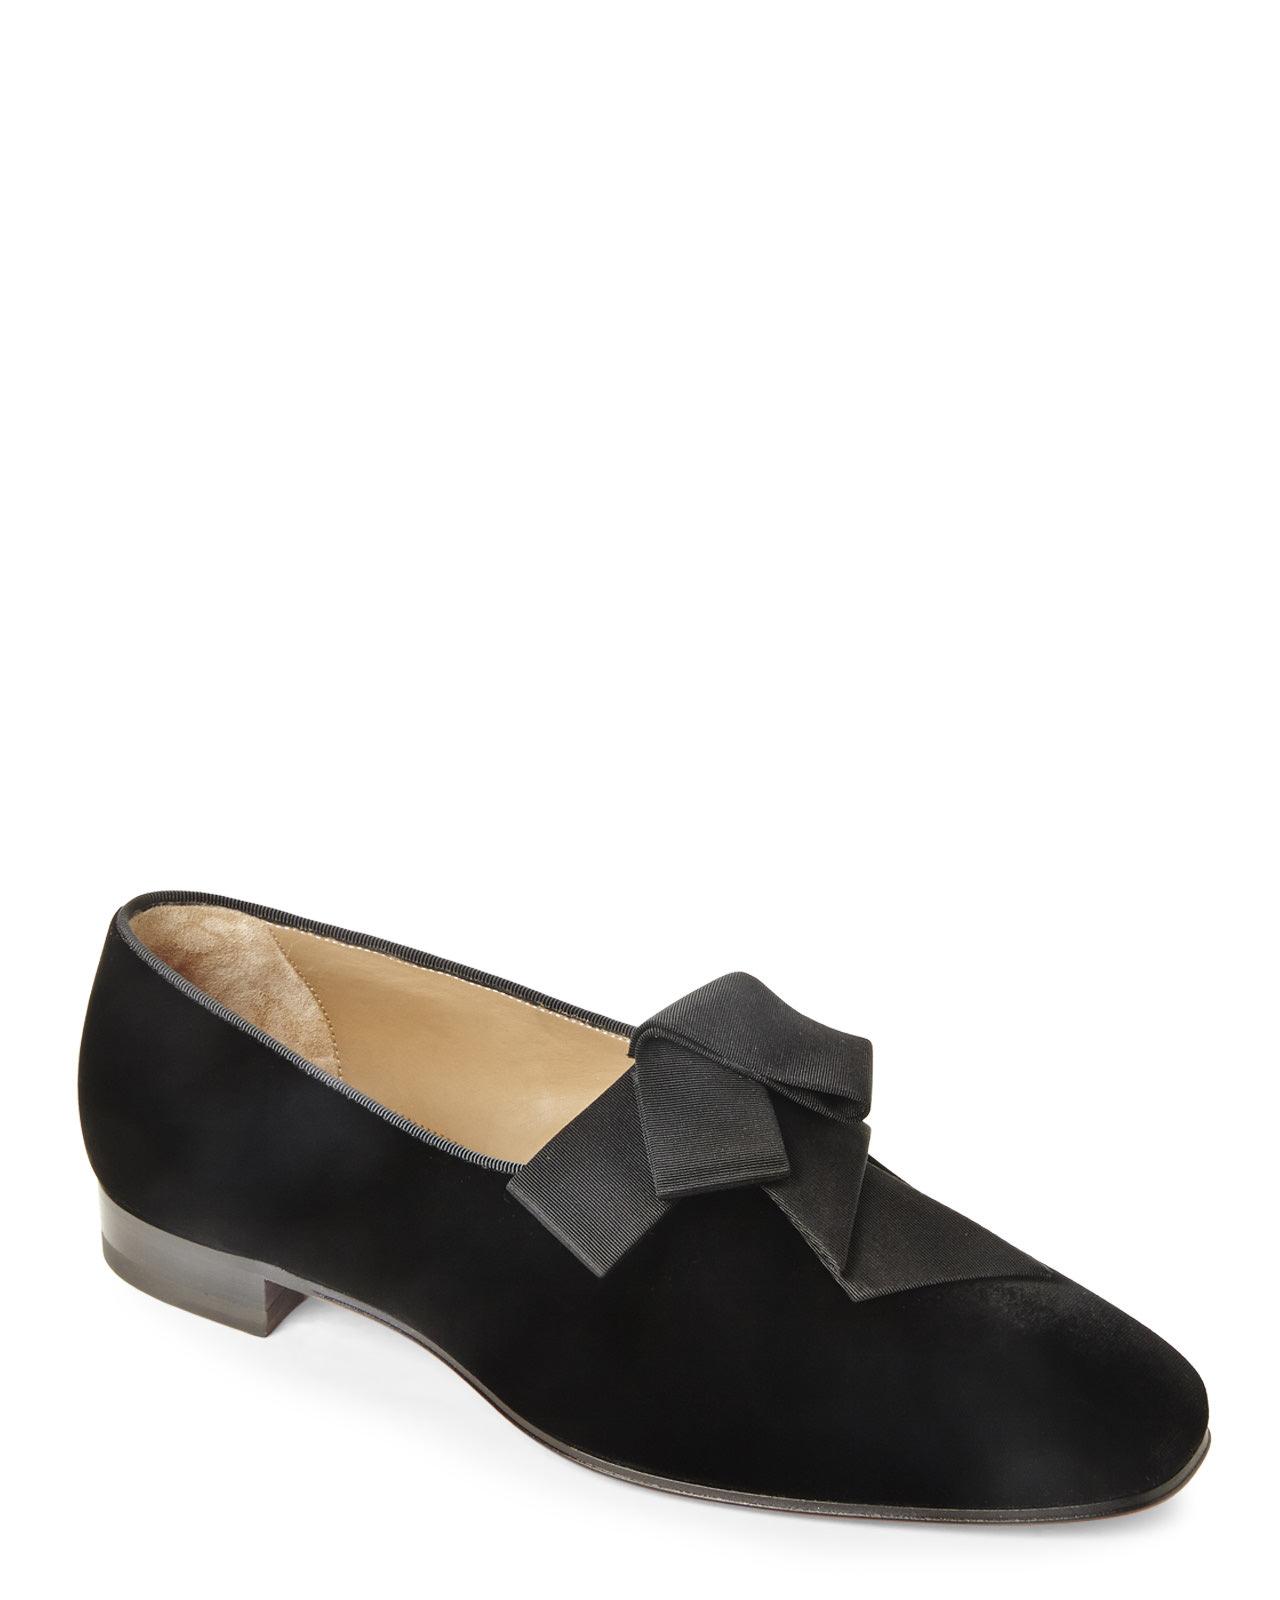 7308f110b9f Christian louboutin Black Mr. Grant Loafers in Black for Men